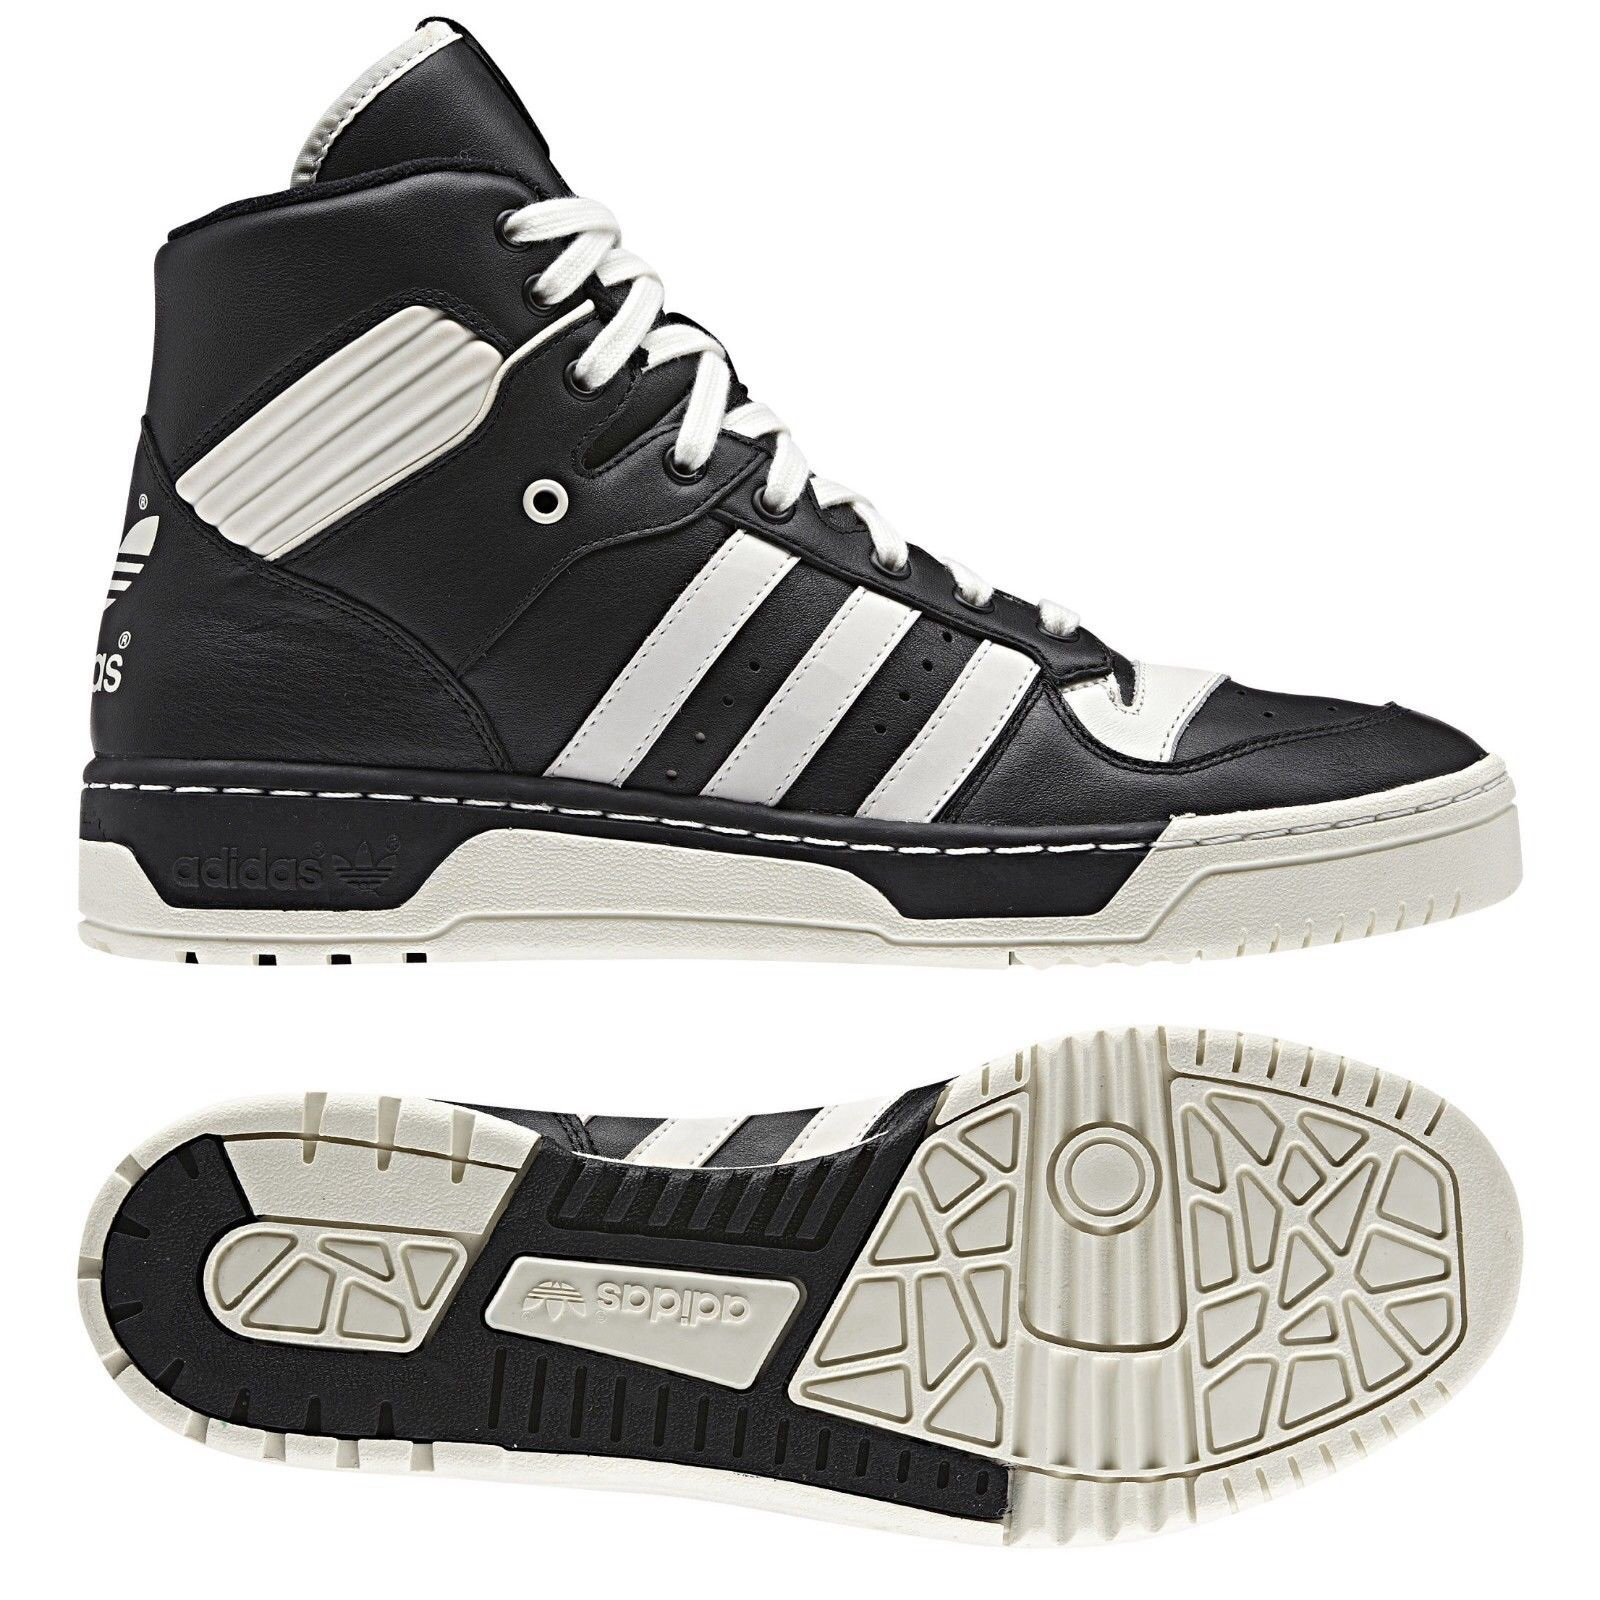 Galleon - Adidas Originals Rivalry Hi Patrick Ewing G96545 Black Chalk White  Men s Shoes (Size 11) ce916dfb1b5d